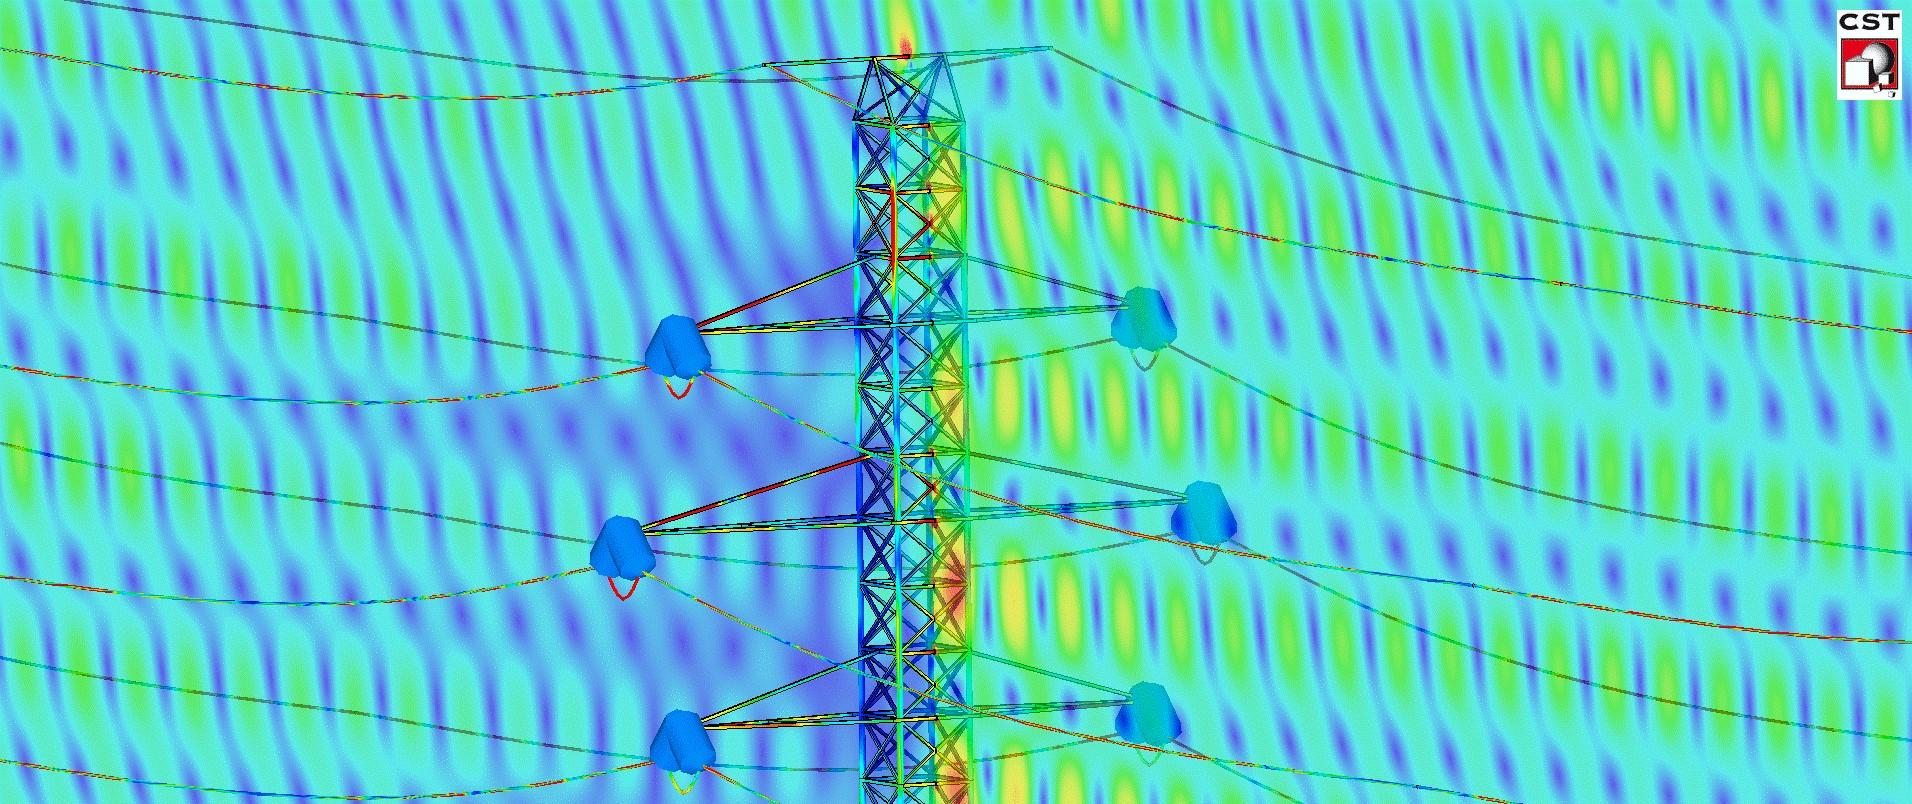 Simulation of Electromagnetic Pulses (EMP) | The SIMULIA Blog